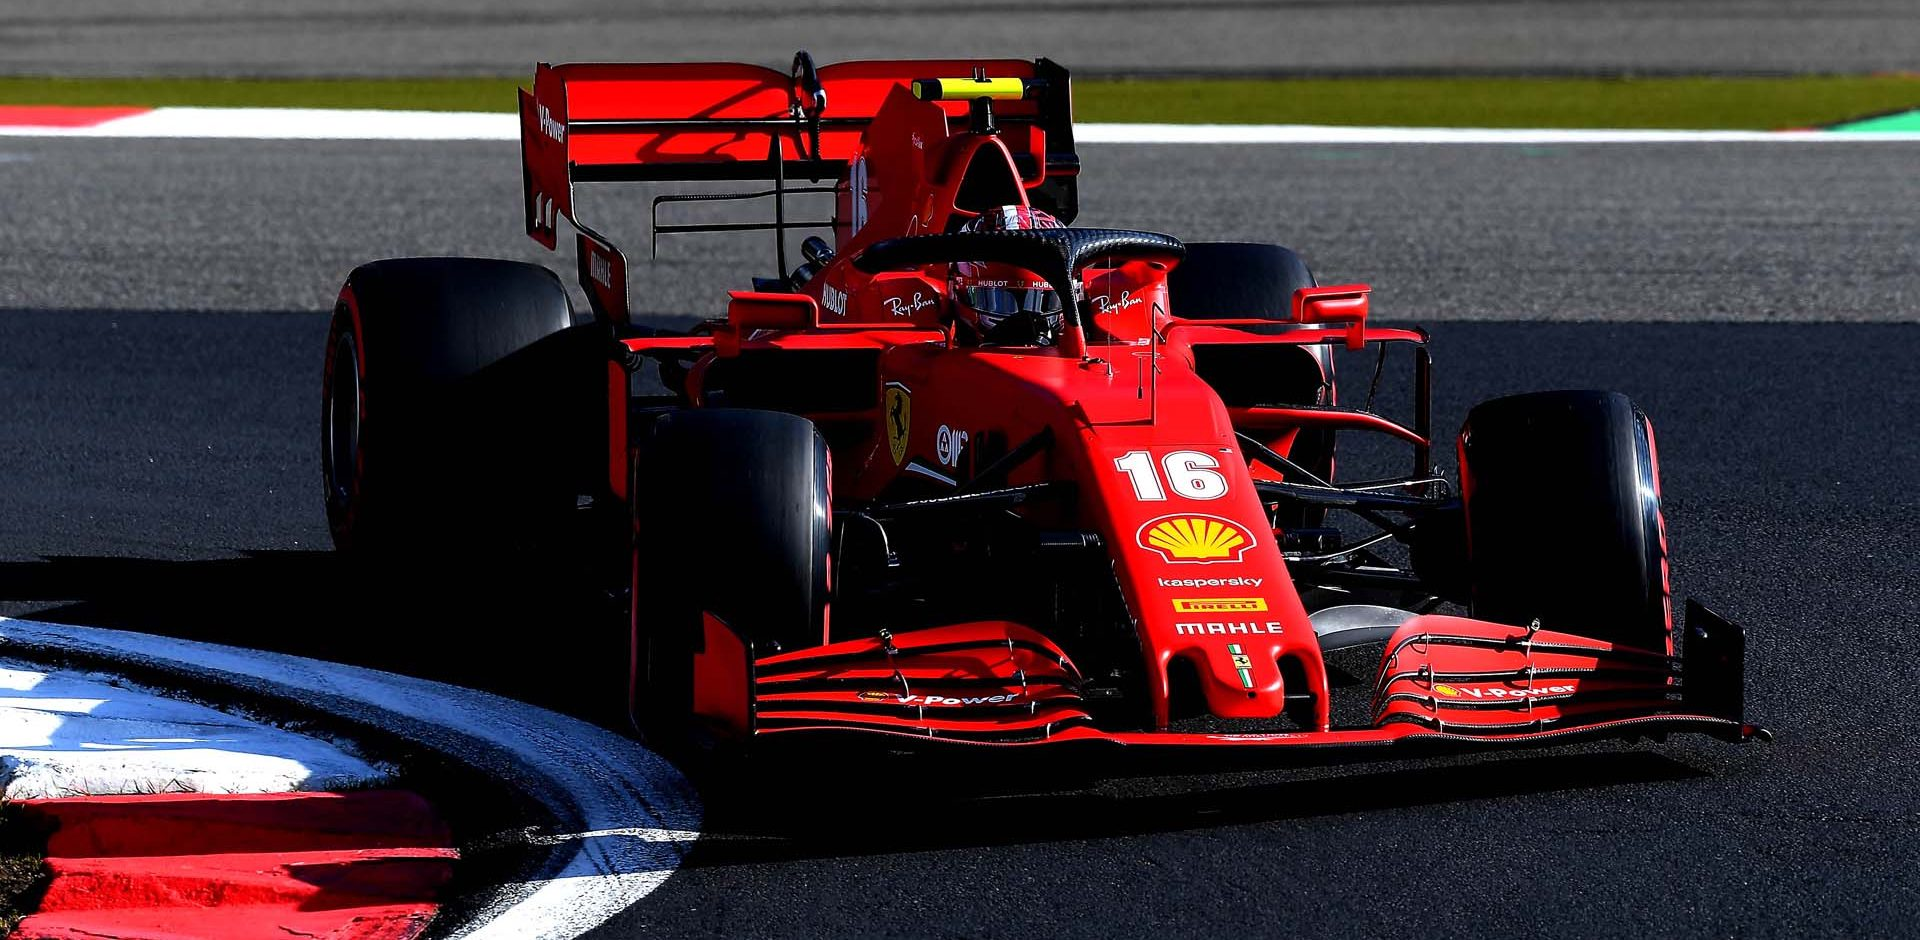 GP GERMANIA F1/2020 -  SABATO  10/10/2020   credit: @Scuderia Ferrari Press Office Charles Leclerc Ferrari